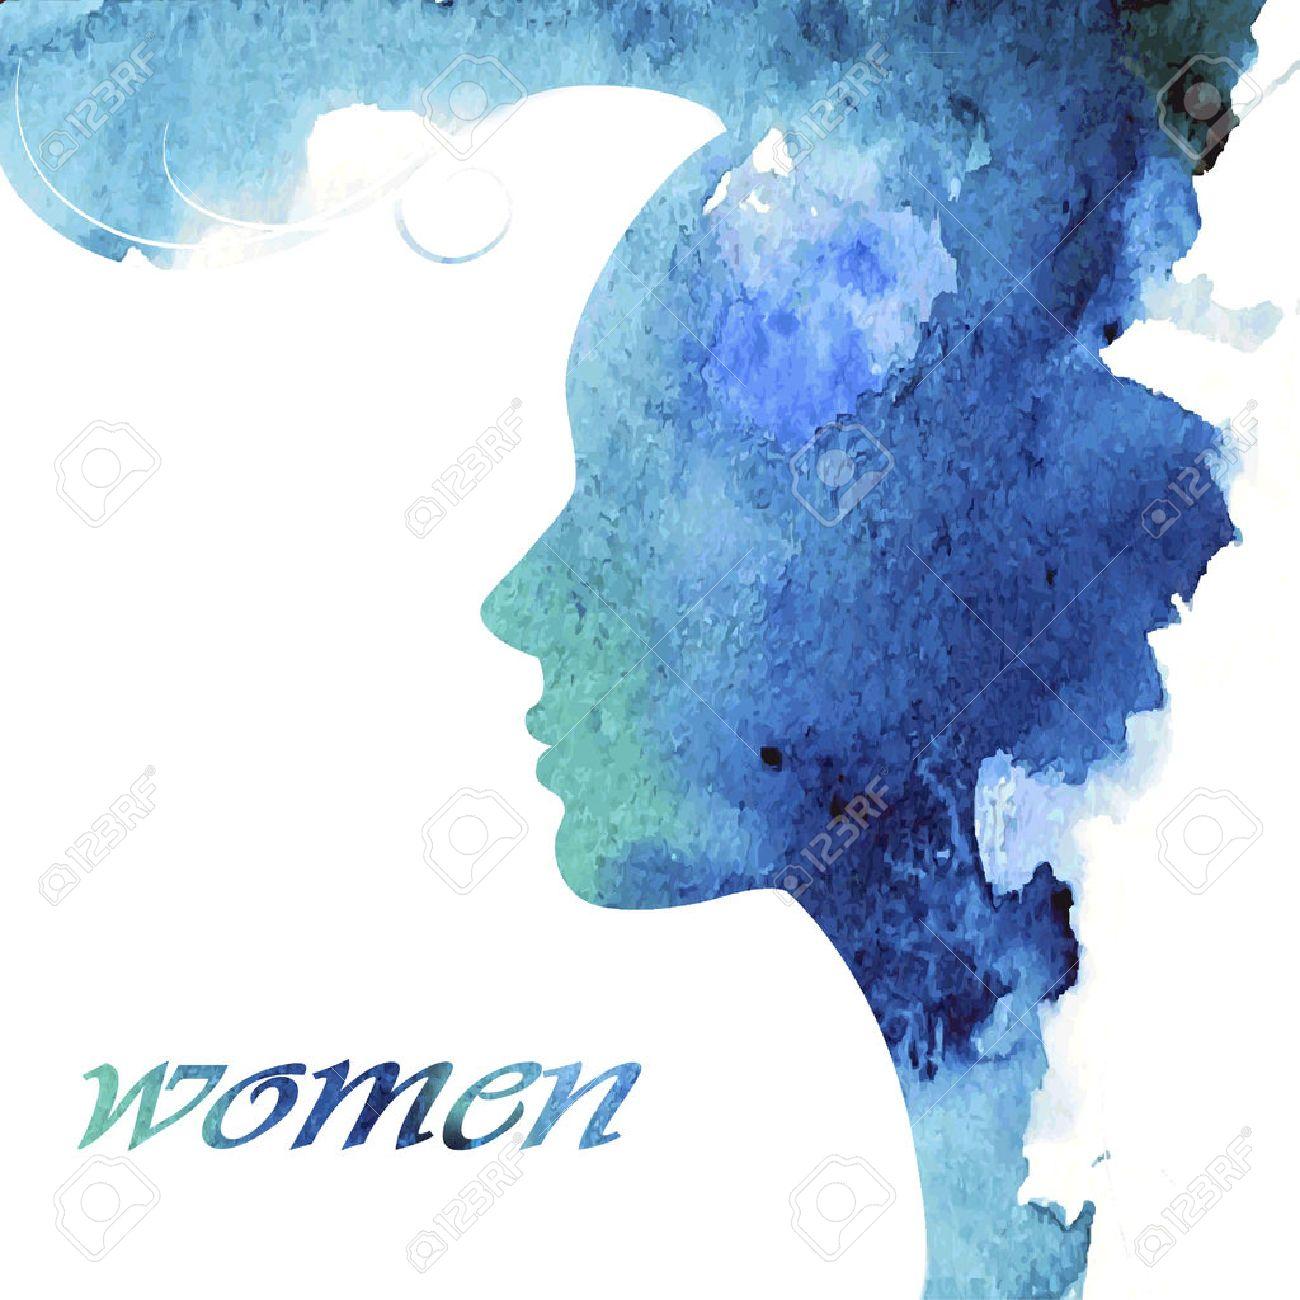 Woman chat vector logo design template. Girl silhouette - cosmetics, beauty, health; spa, fashion themes. Creative icon. - 39520564